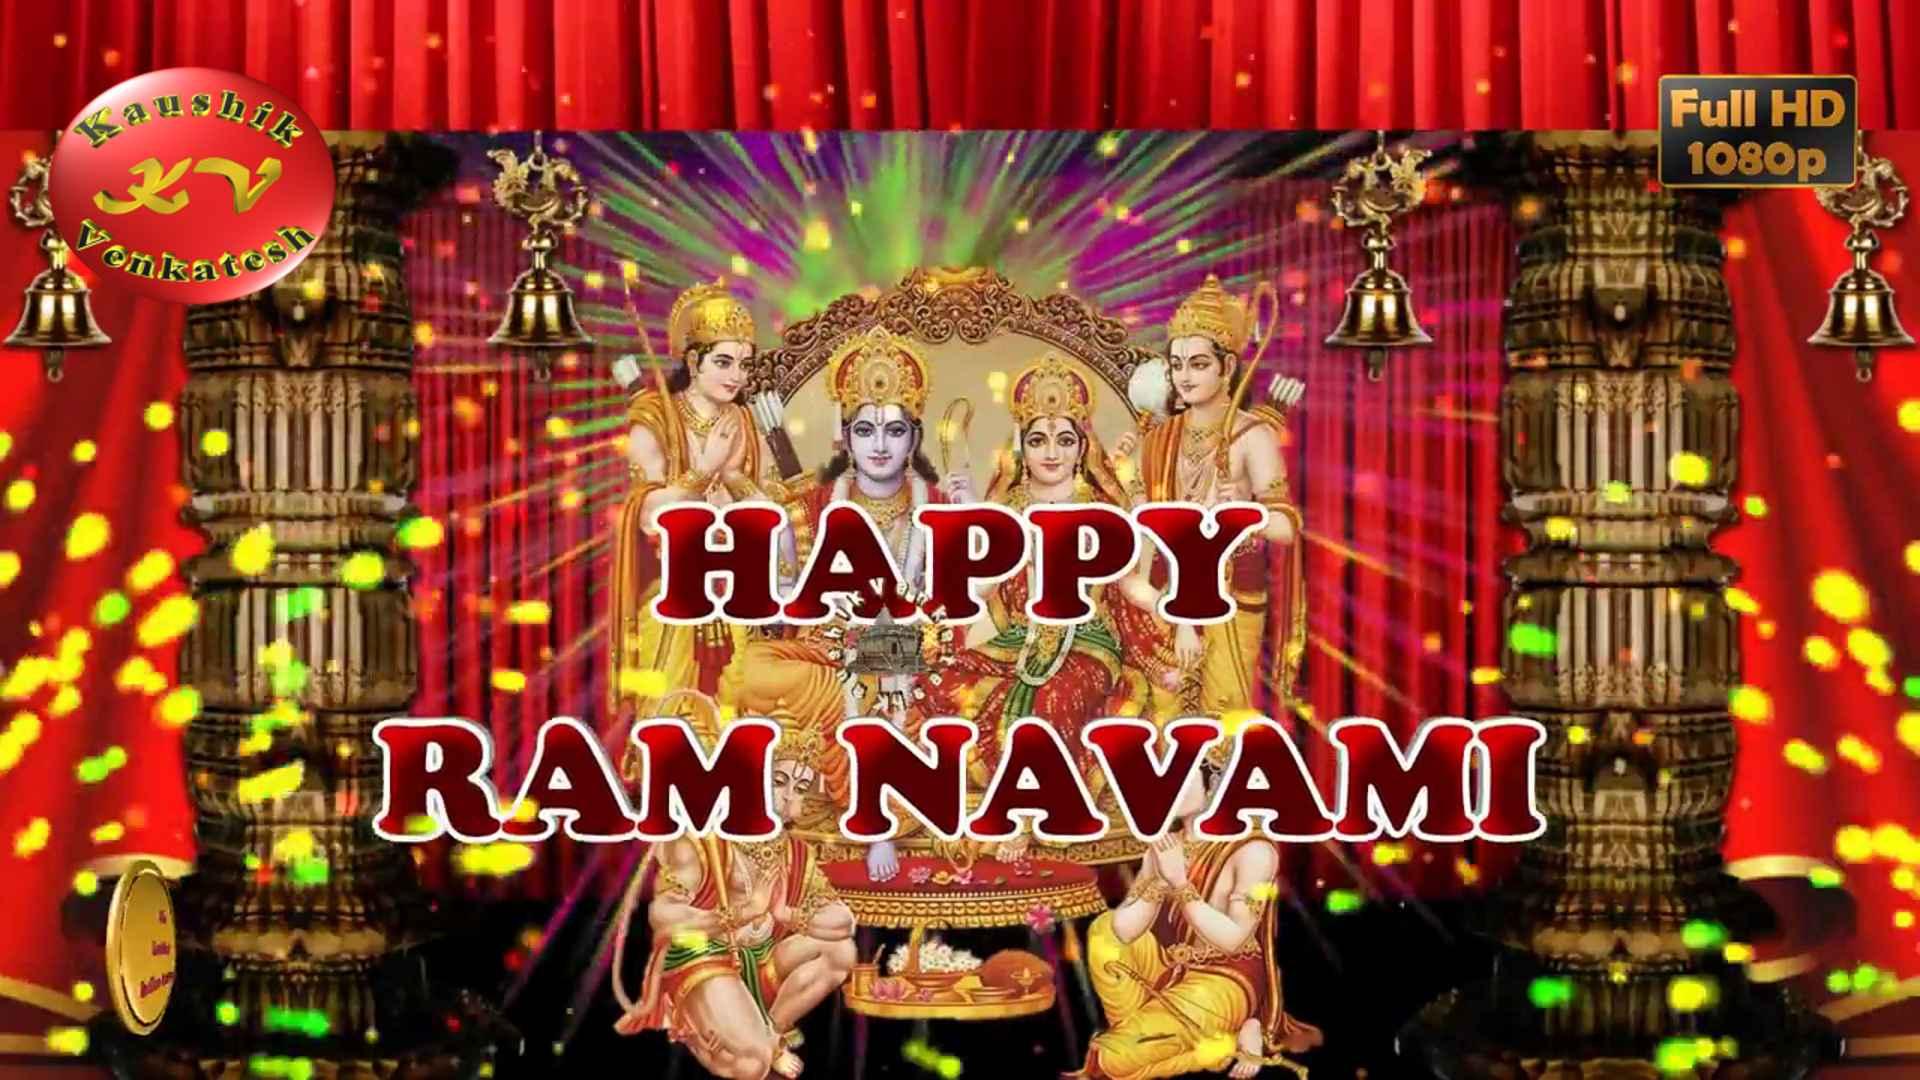 Ram Navami Wishes Images